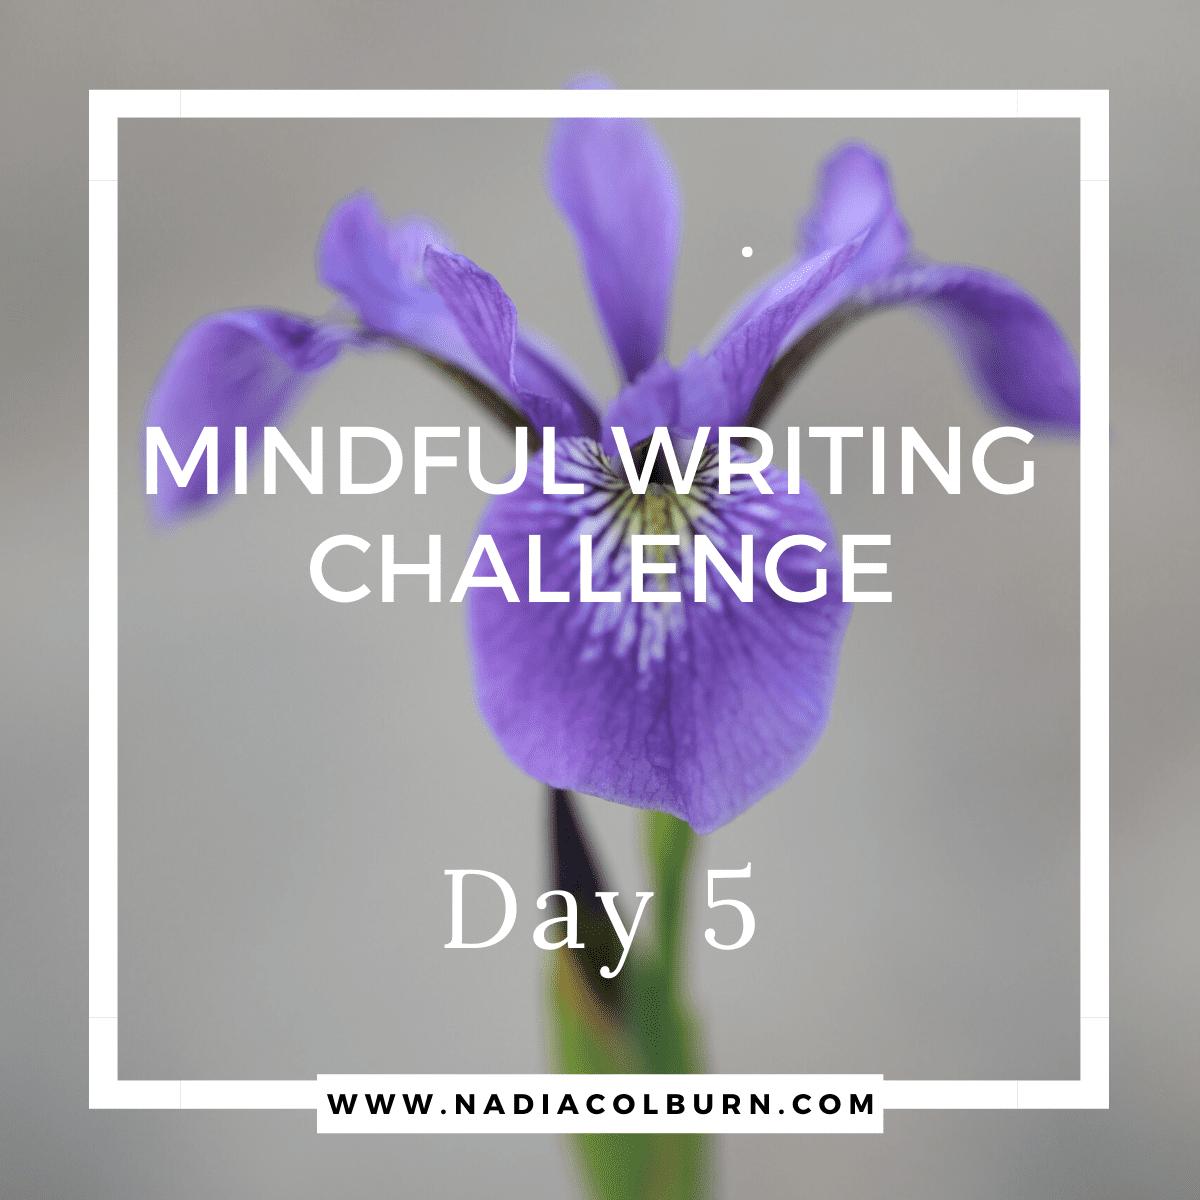 Mindful Writing Challenge Day 5 9